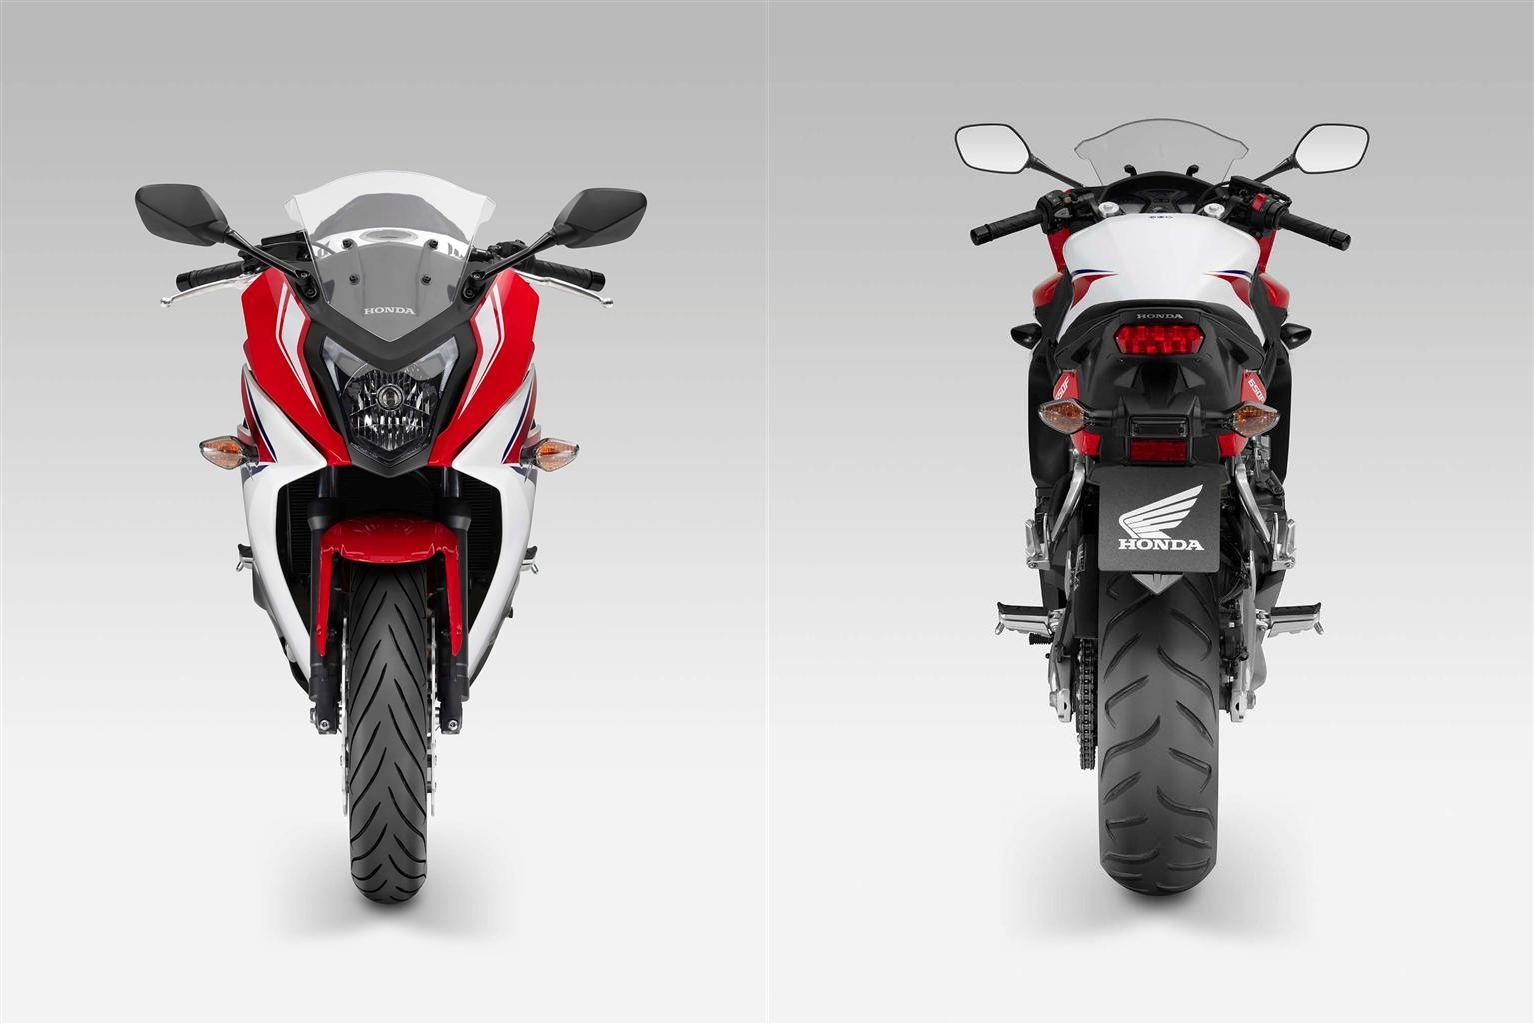 Upcoming Honda Bikes In India 2014 | Autos Weblog